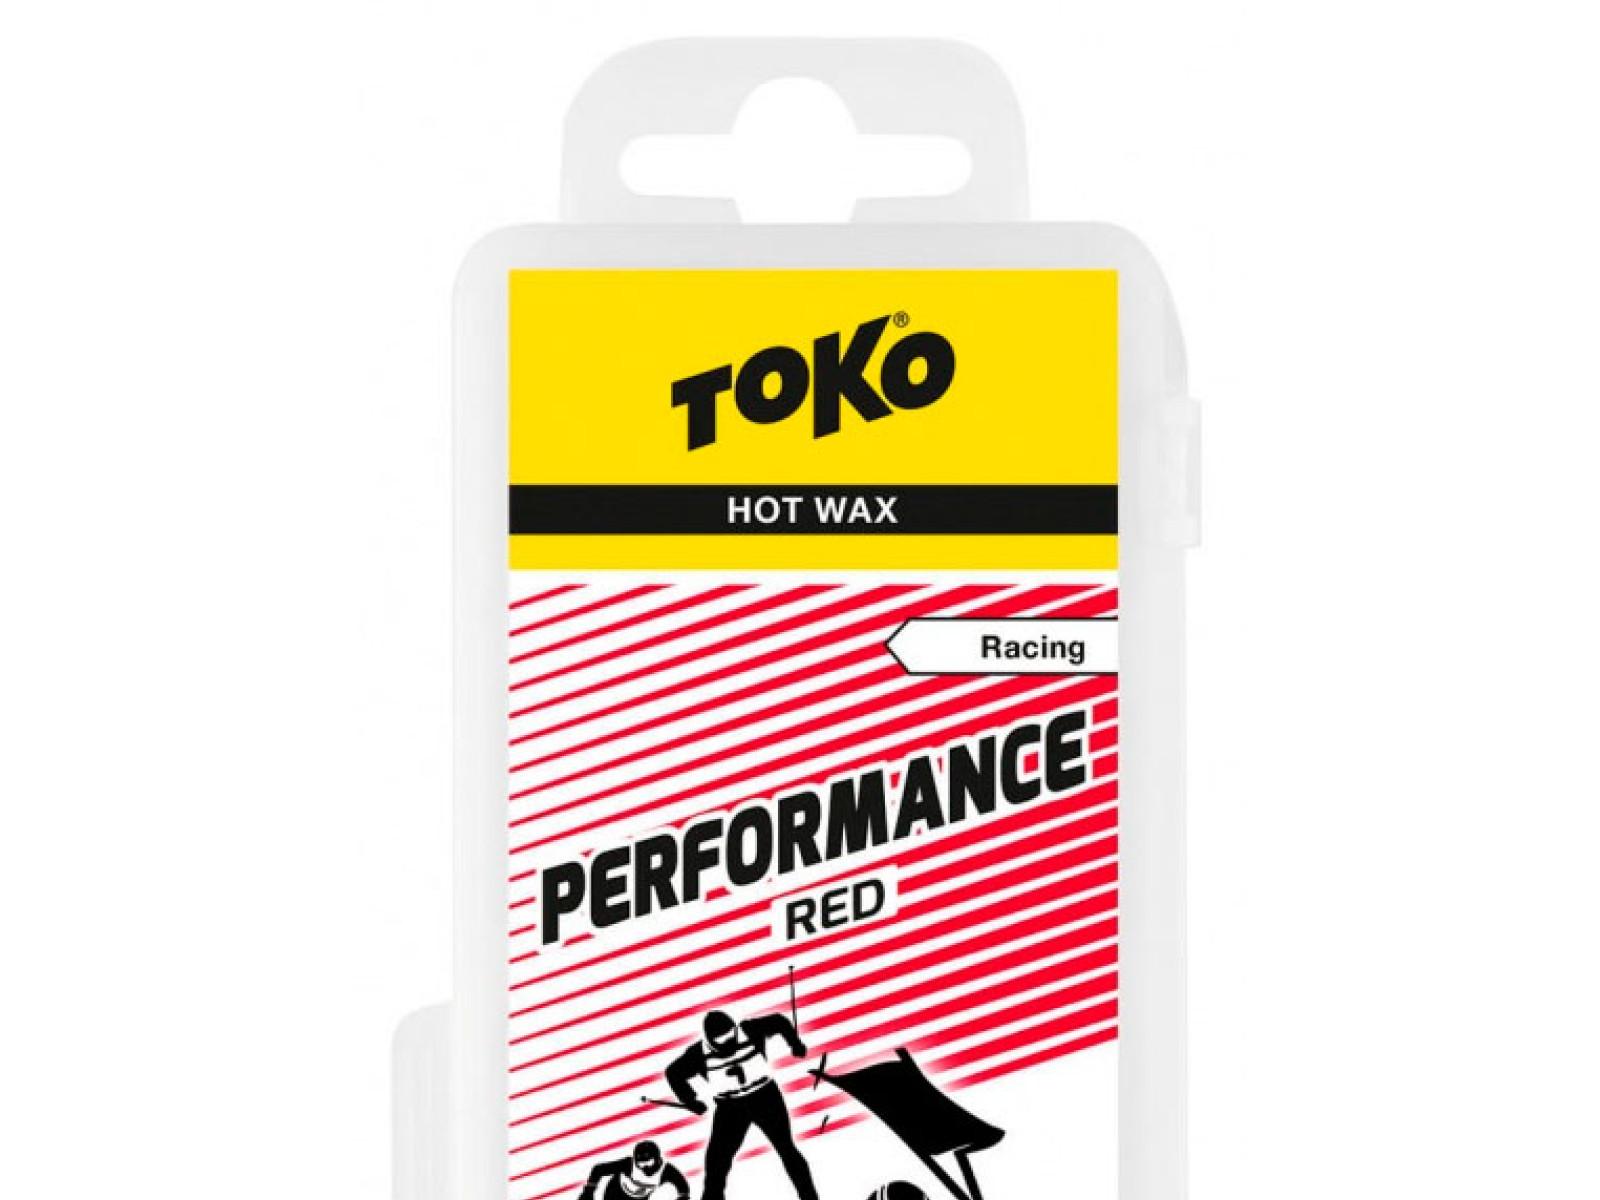 TOKO Performance Red 120g, červený parafín (LF) 2019/2020